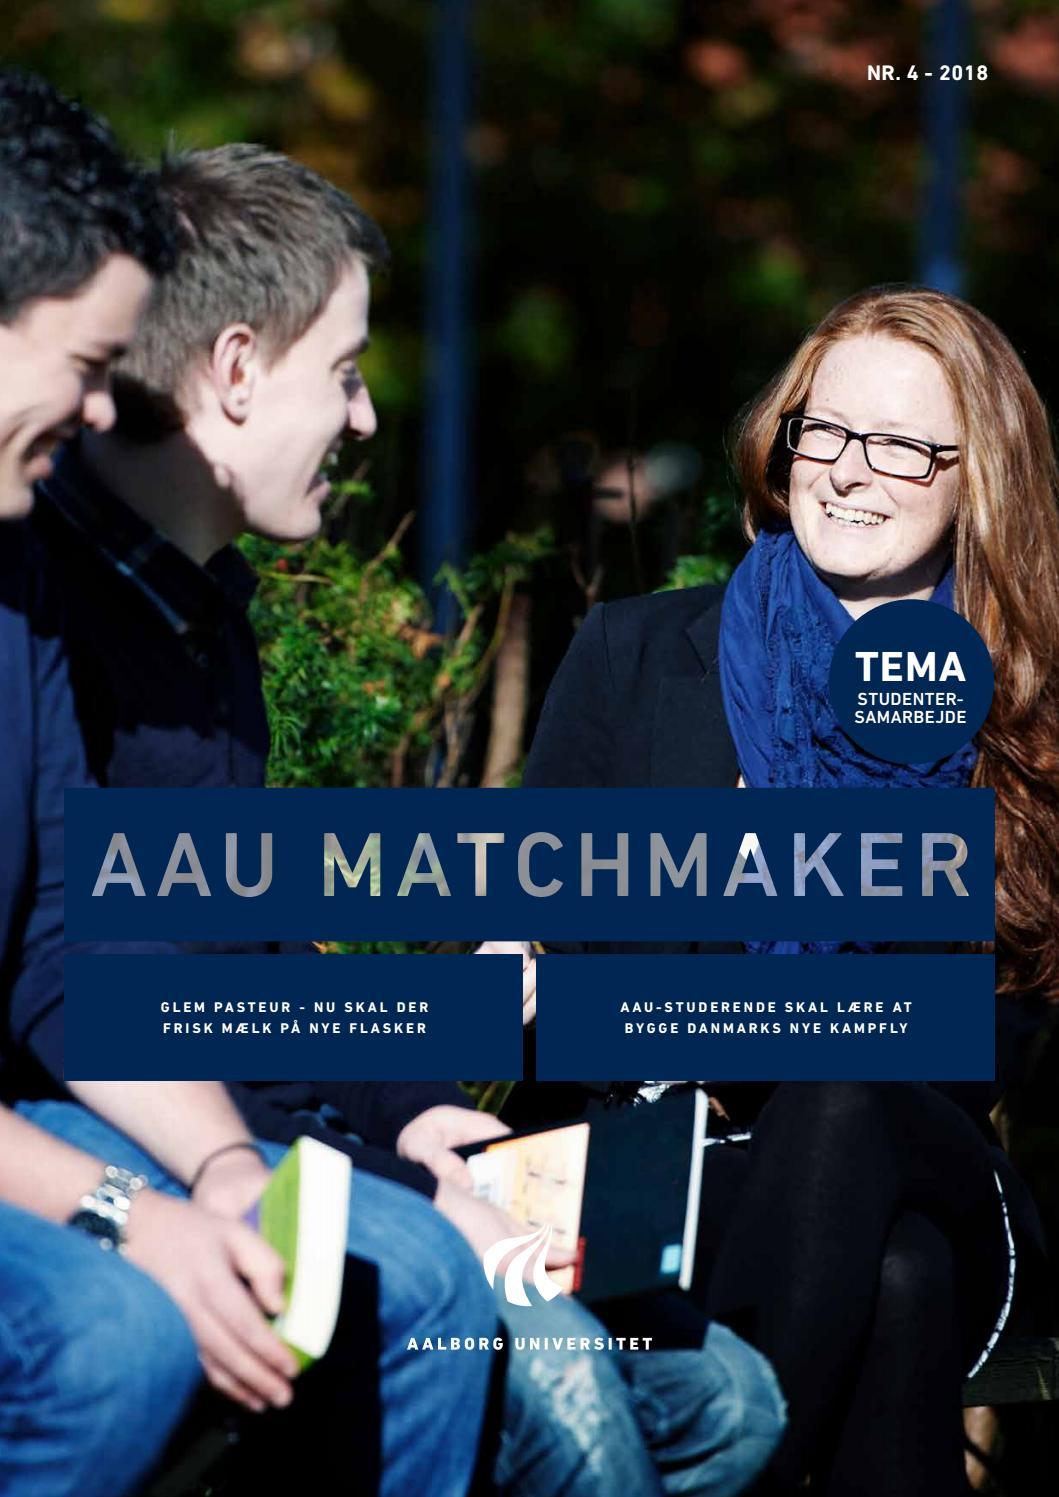 Aau Matchmaking konference 2014 Die beliebtesten Dating-Websites in ireland